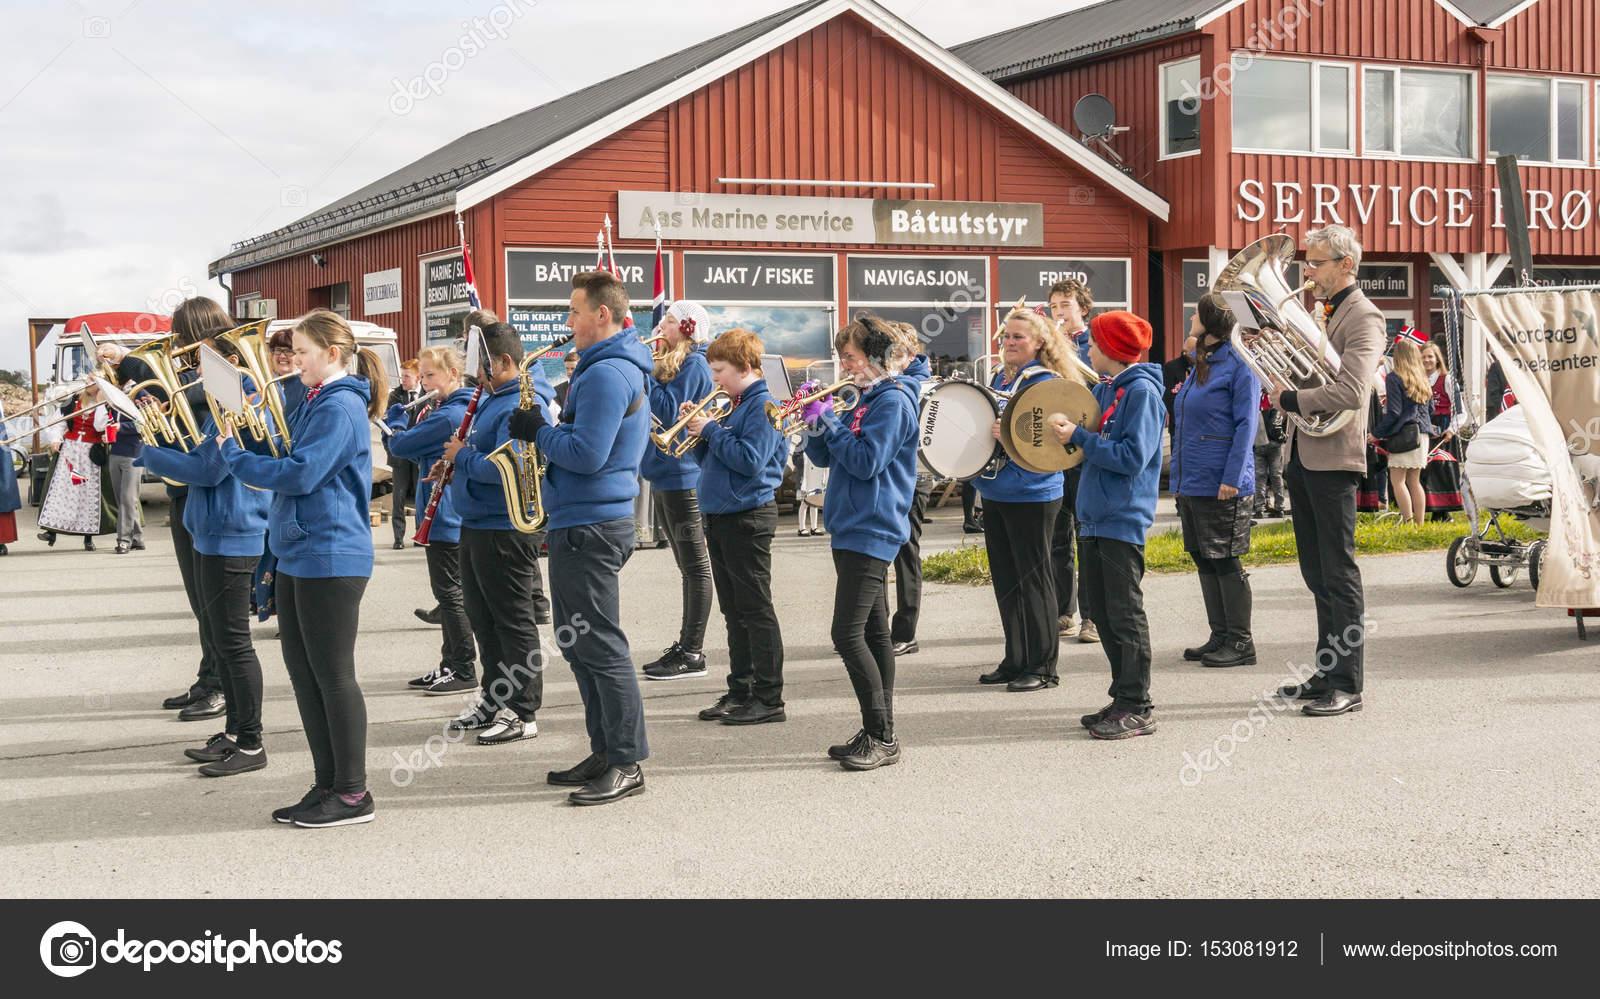 2a89295cf51 Νορβηγική ορχήστρα με μέσα στα γαλάζια φορέματα – Εκδοτική Εικόνα ...